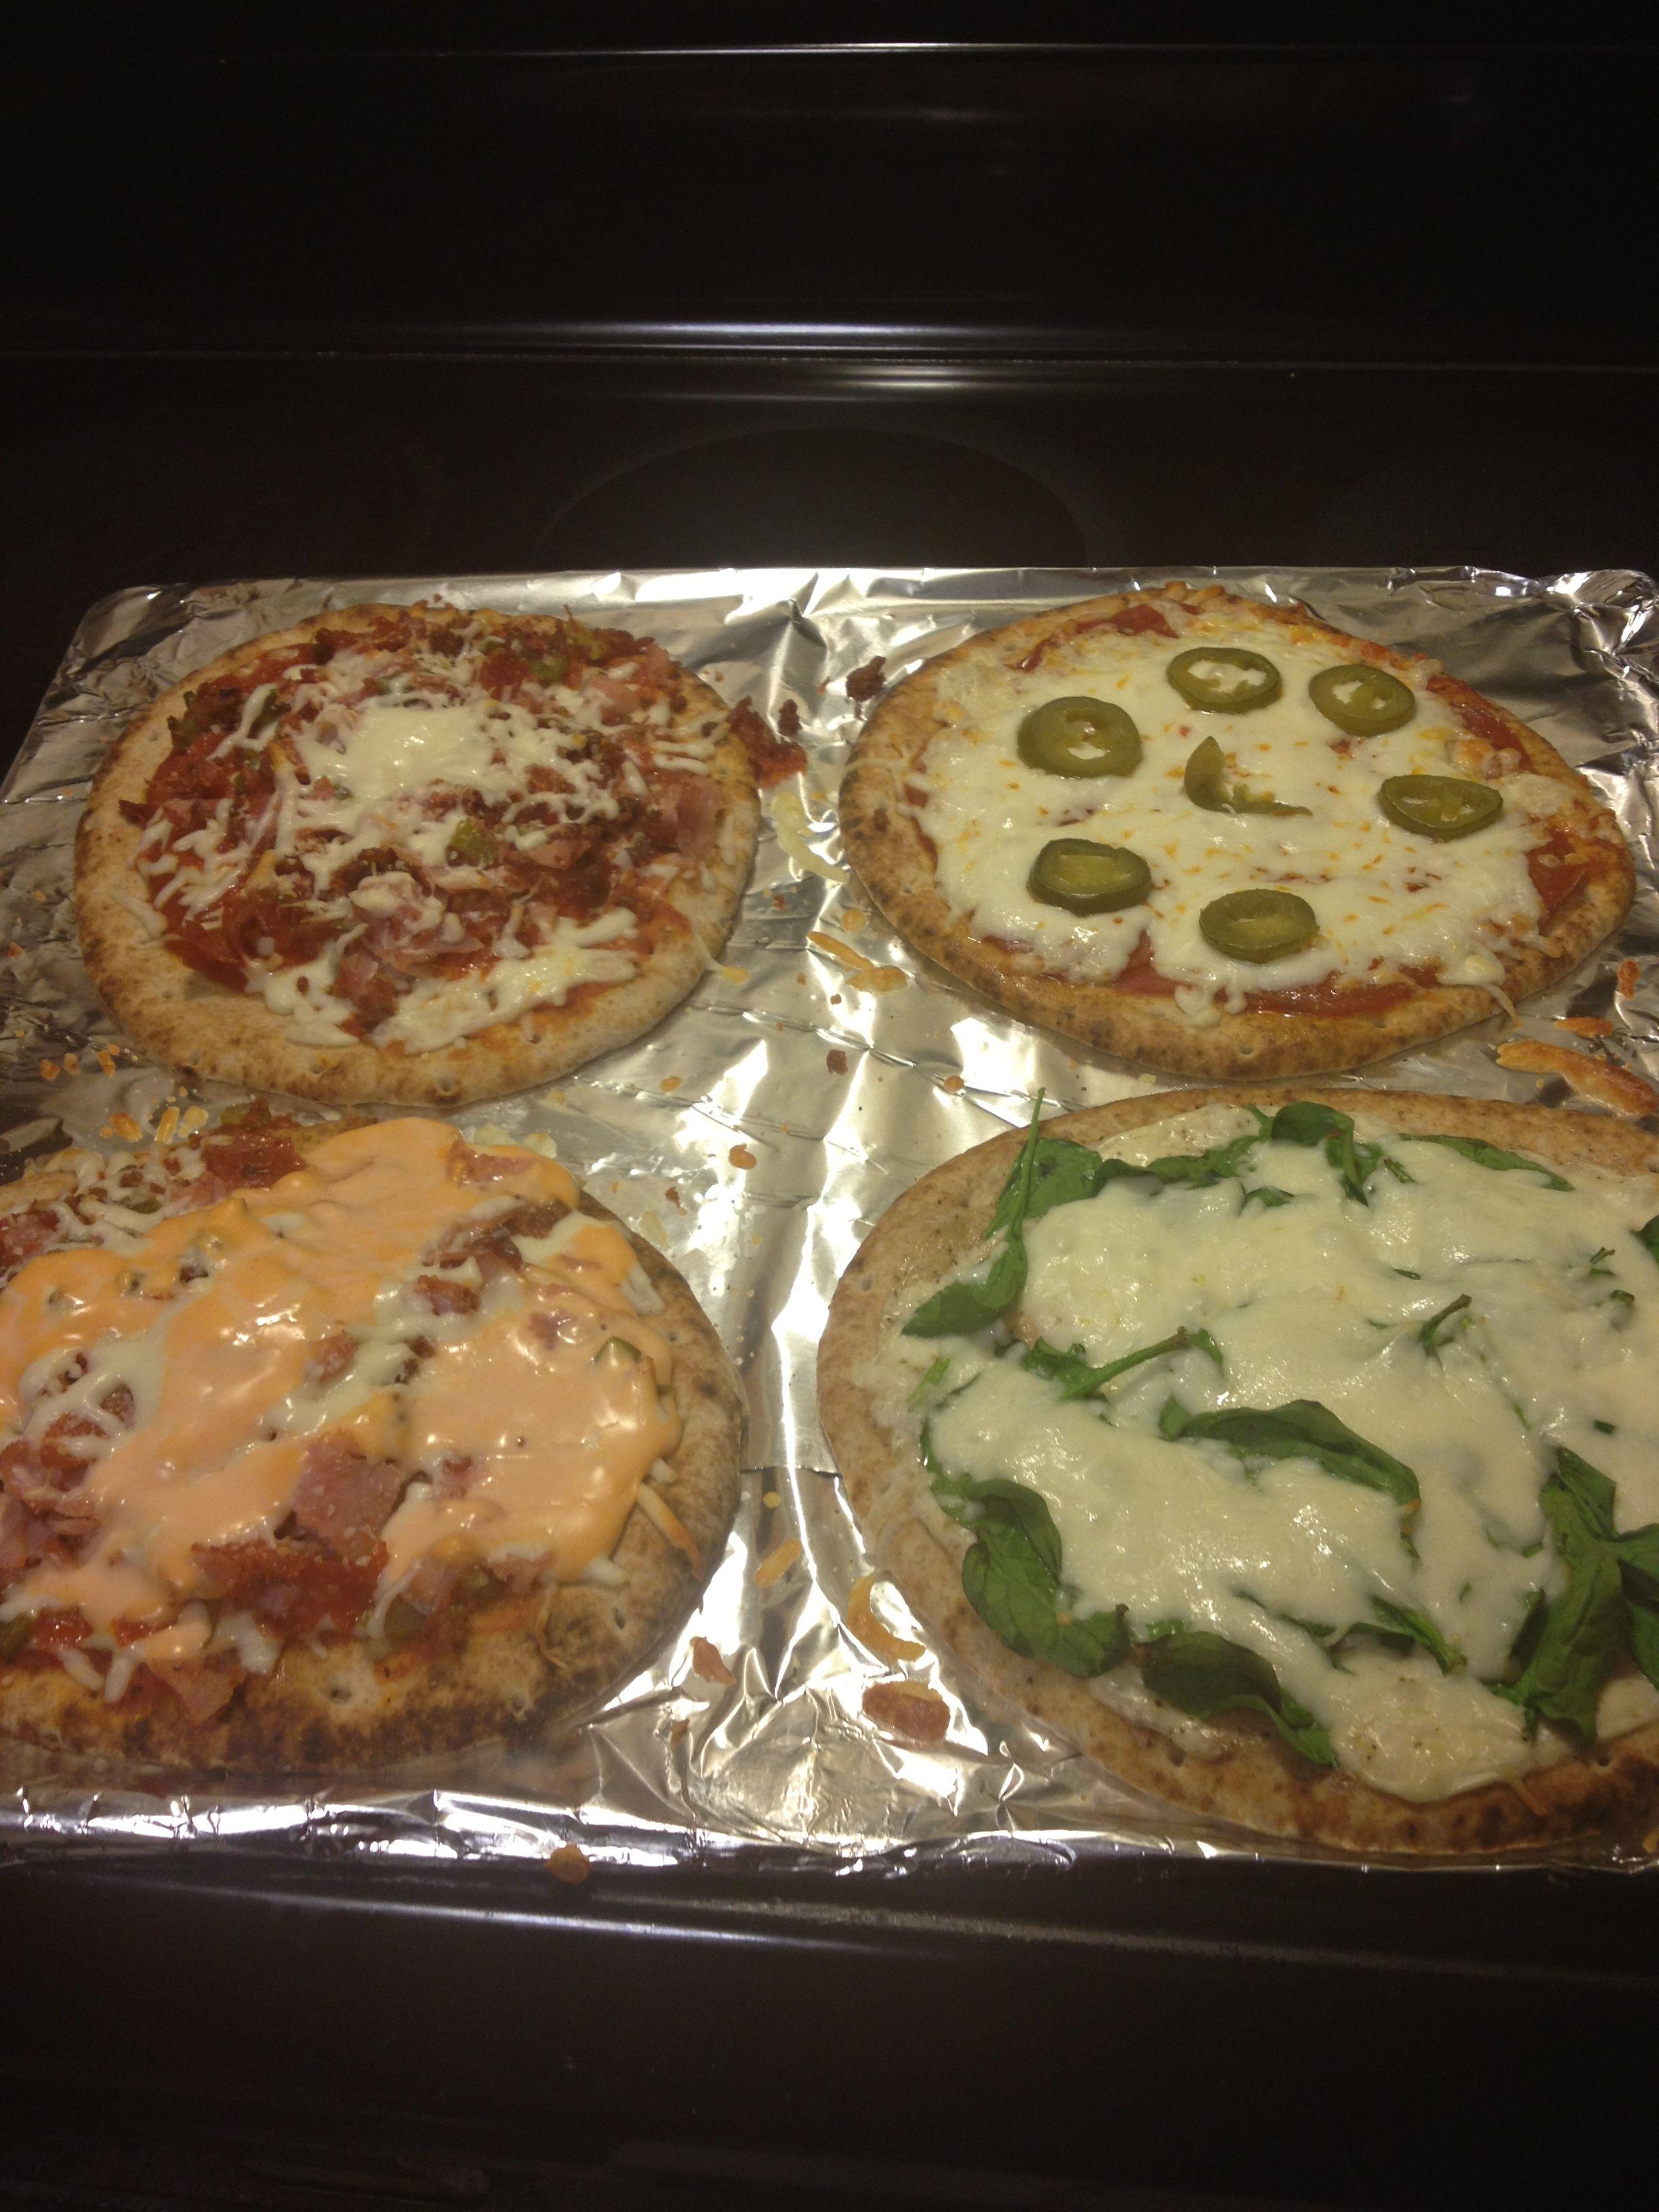 Yummo!!! Flat bread pizza. Teej is awesome!